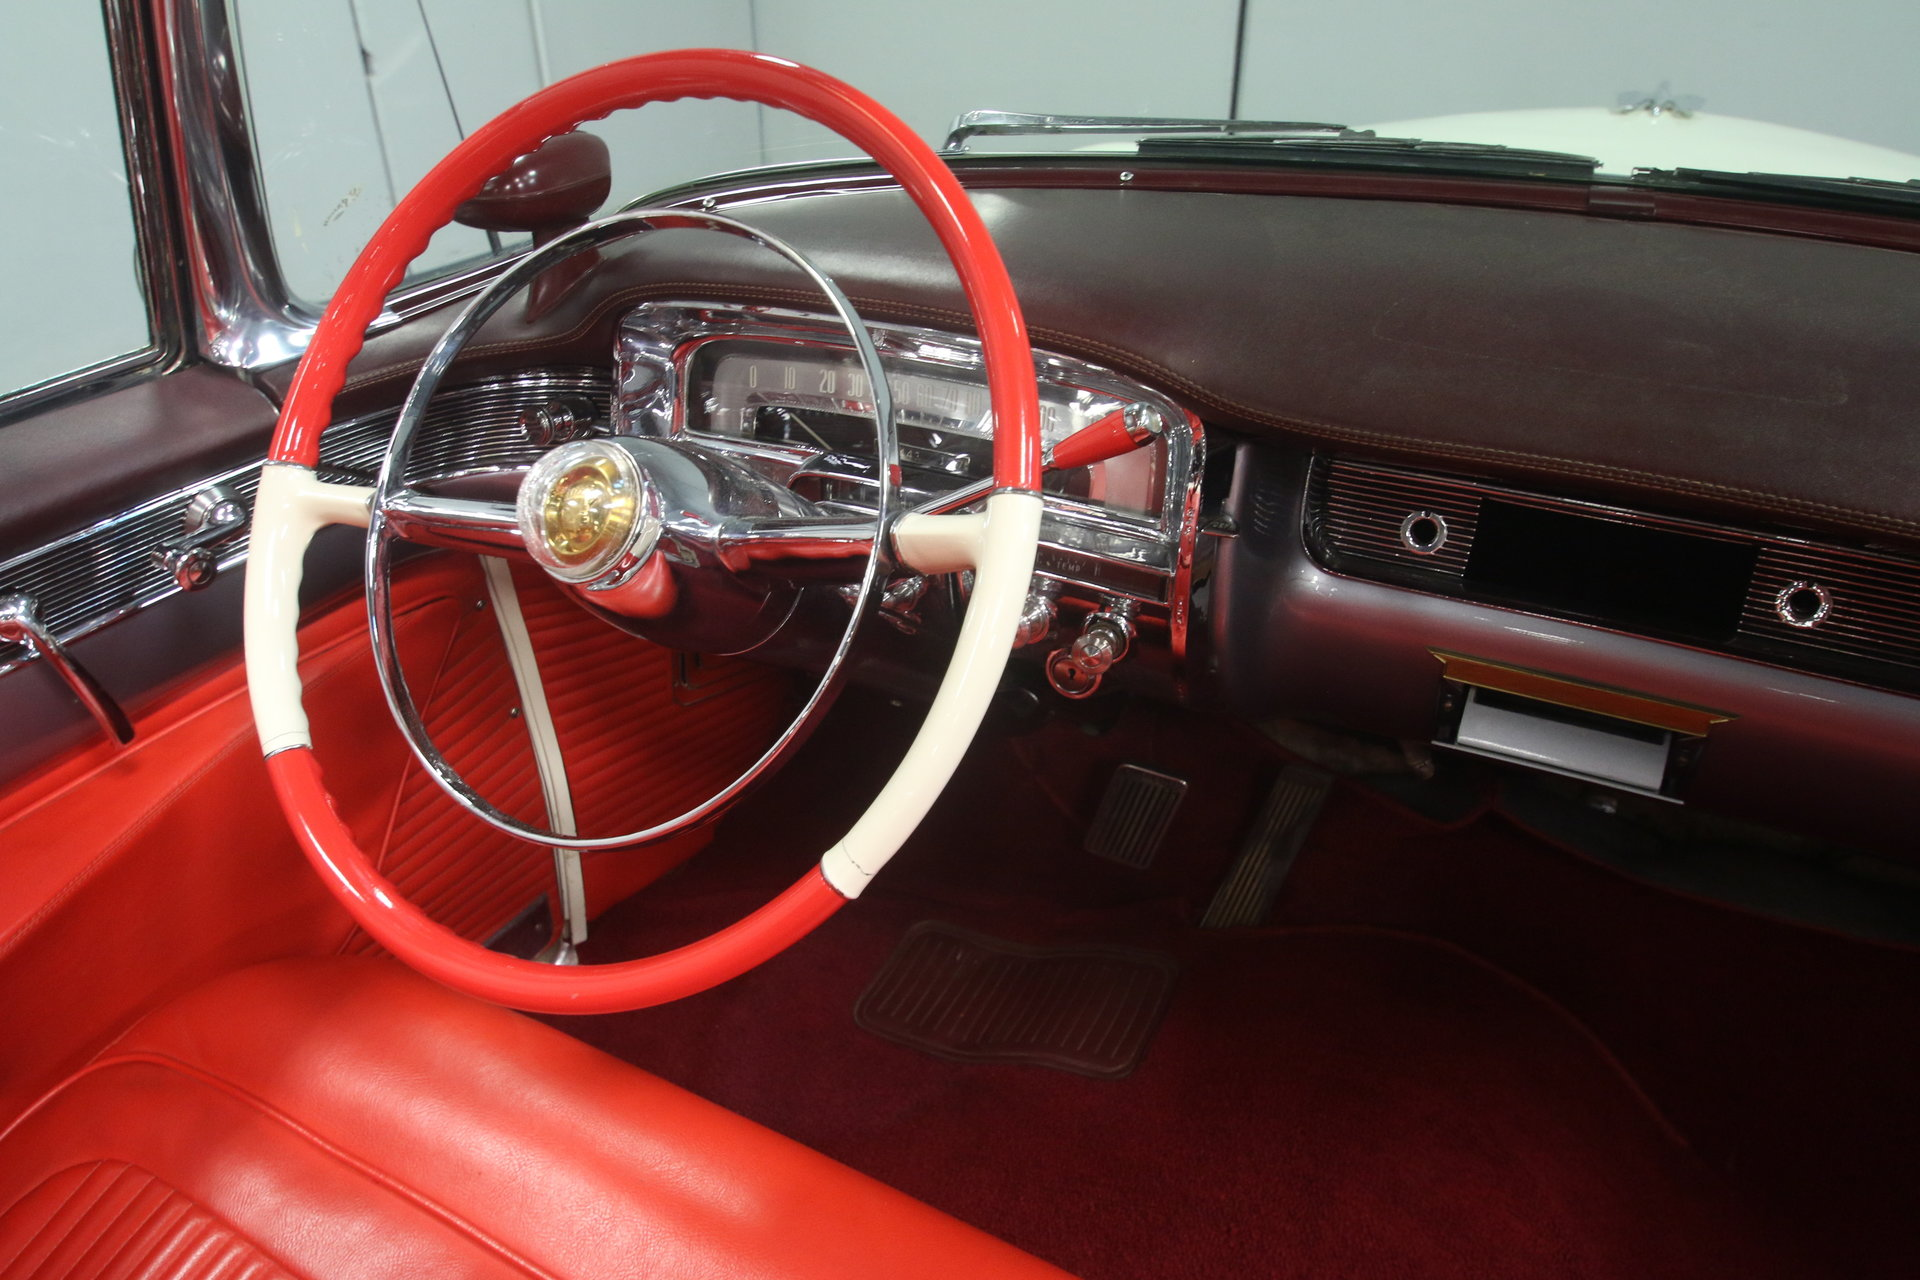 1954 Cadillac Eldorado Streetside Classics The Nations Trusted El Dorado For Sale Spincar View 360